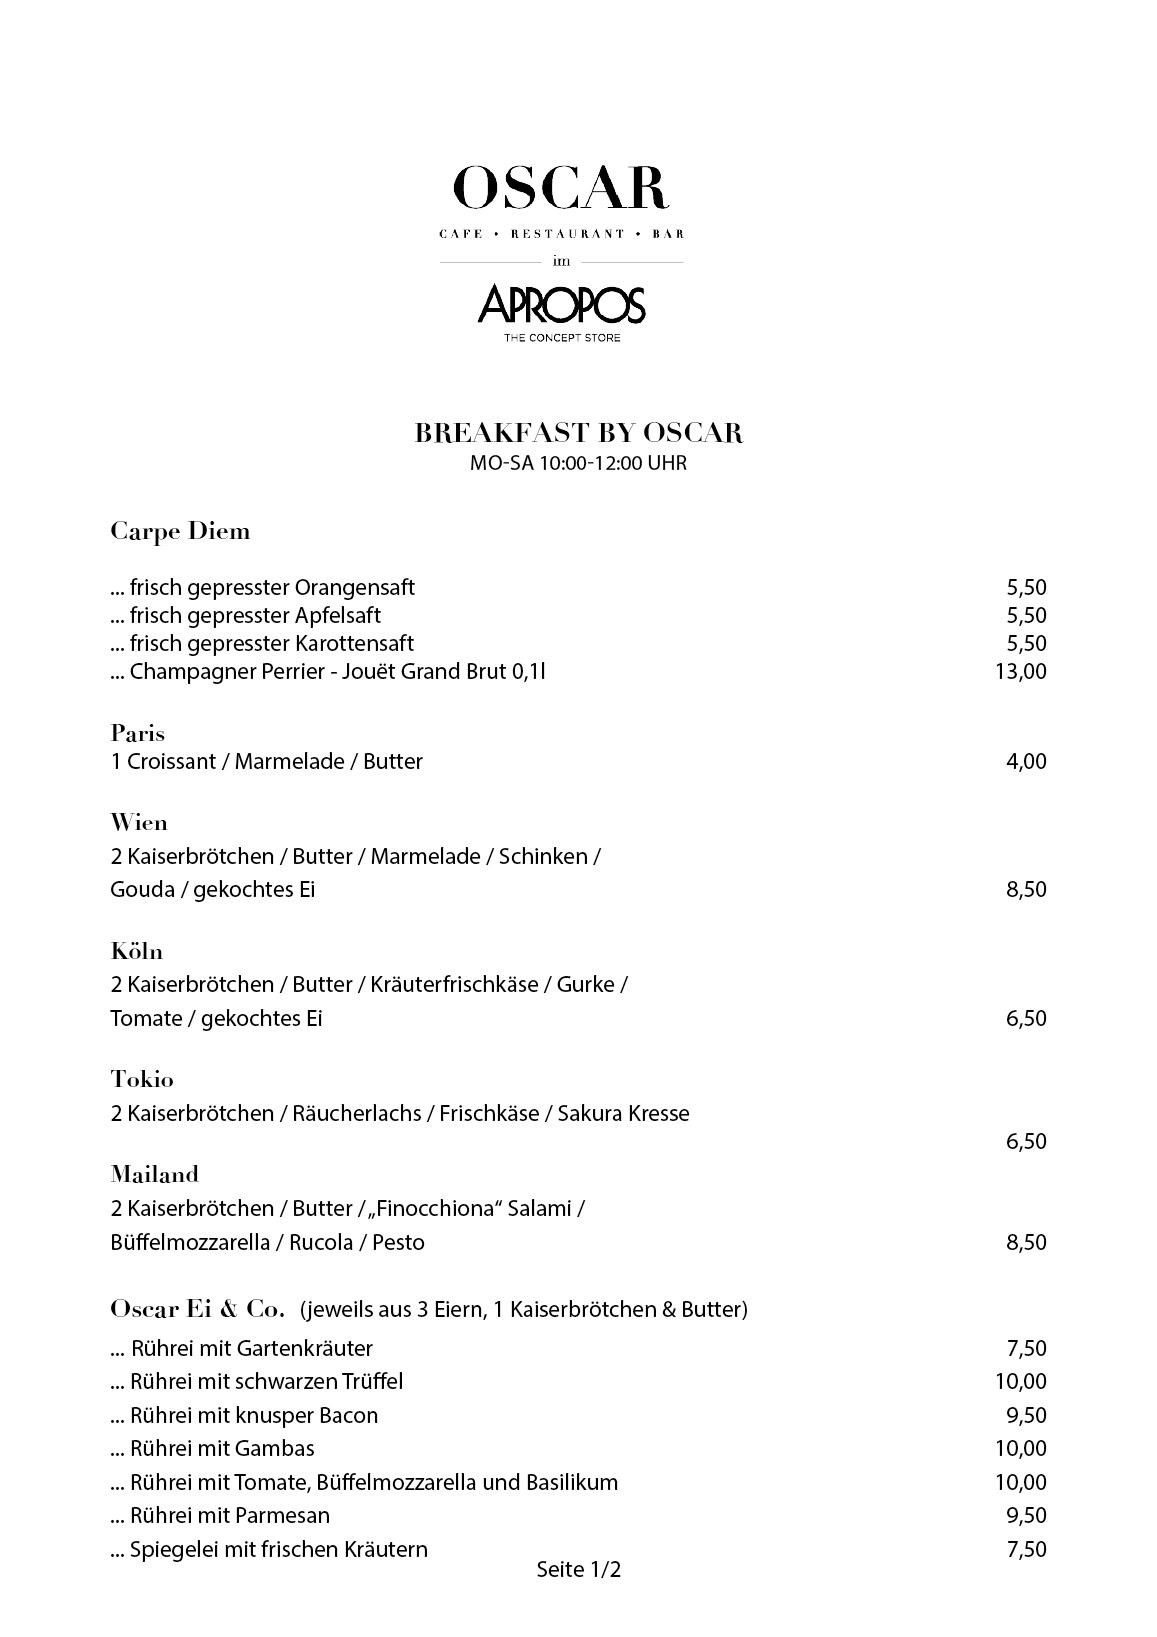 OSCAR im APROPOS - Bar, Restaurant, Café in Köln